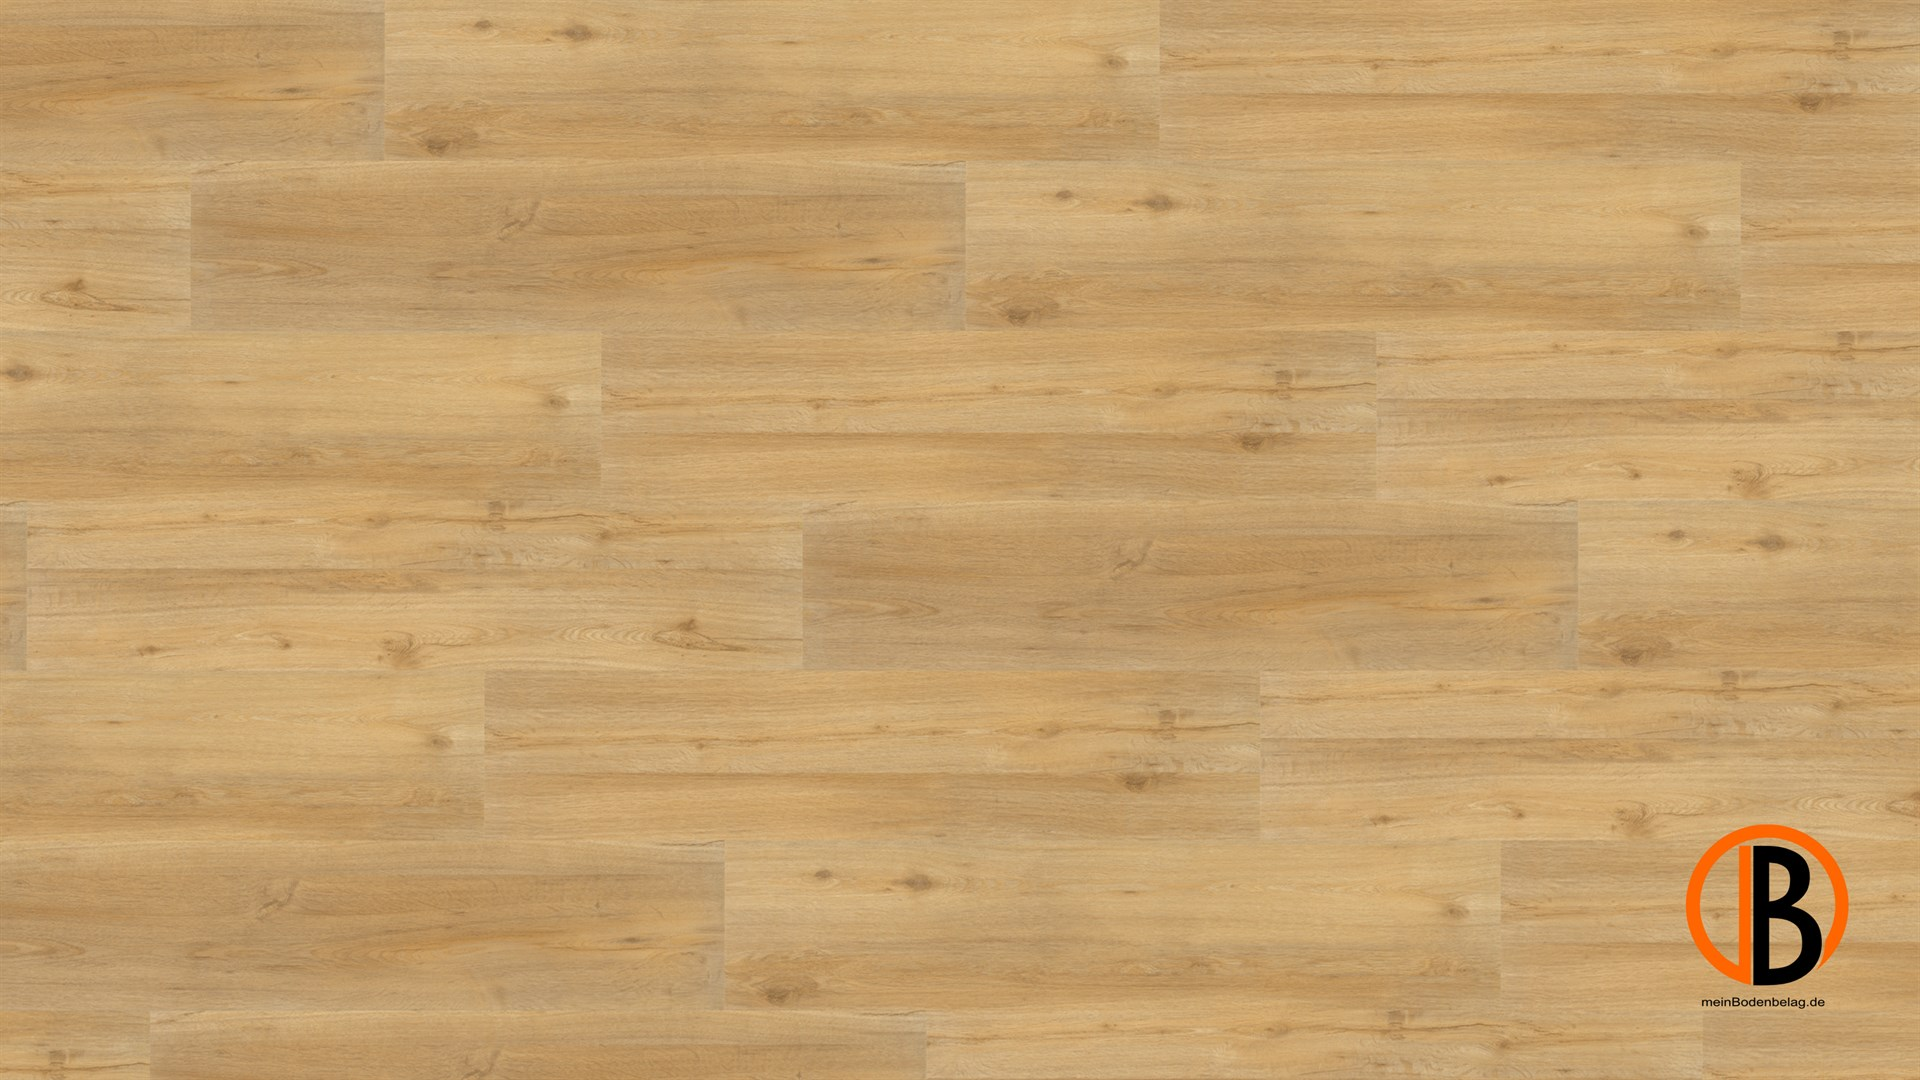 CINQUE KWG DESIGNERVINYL ANTIGUA INFINITY SHEETS | 10000194;0 | Bild 1